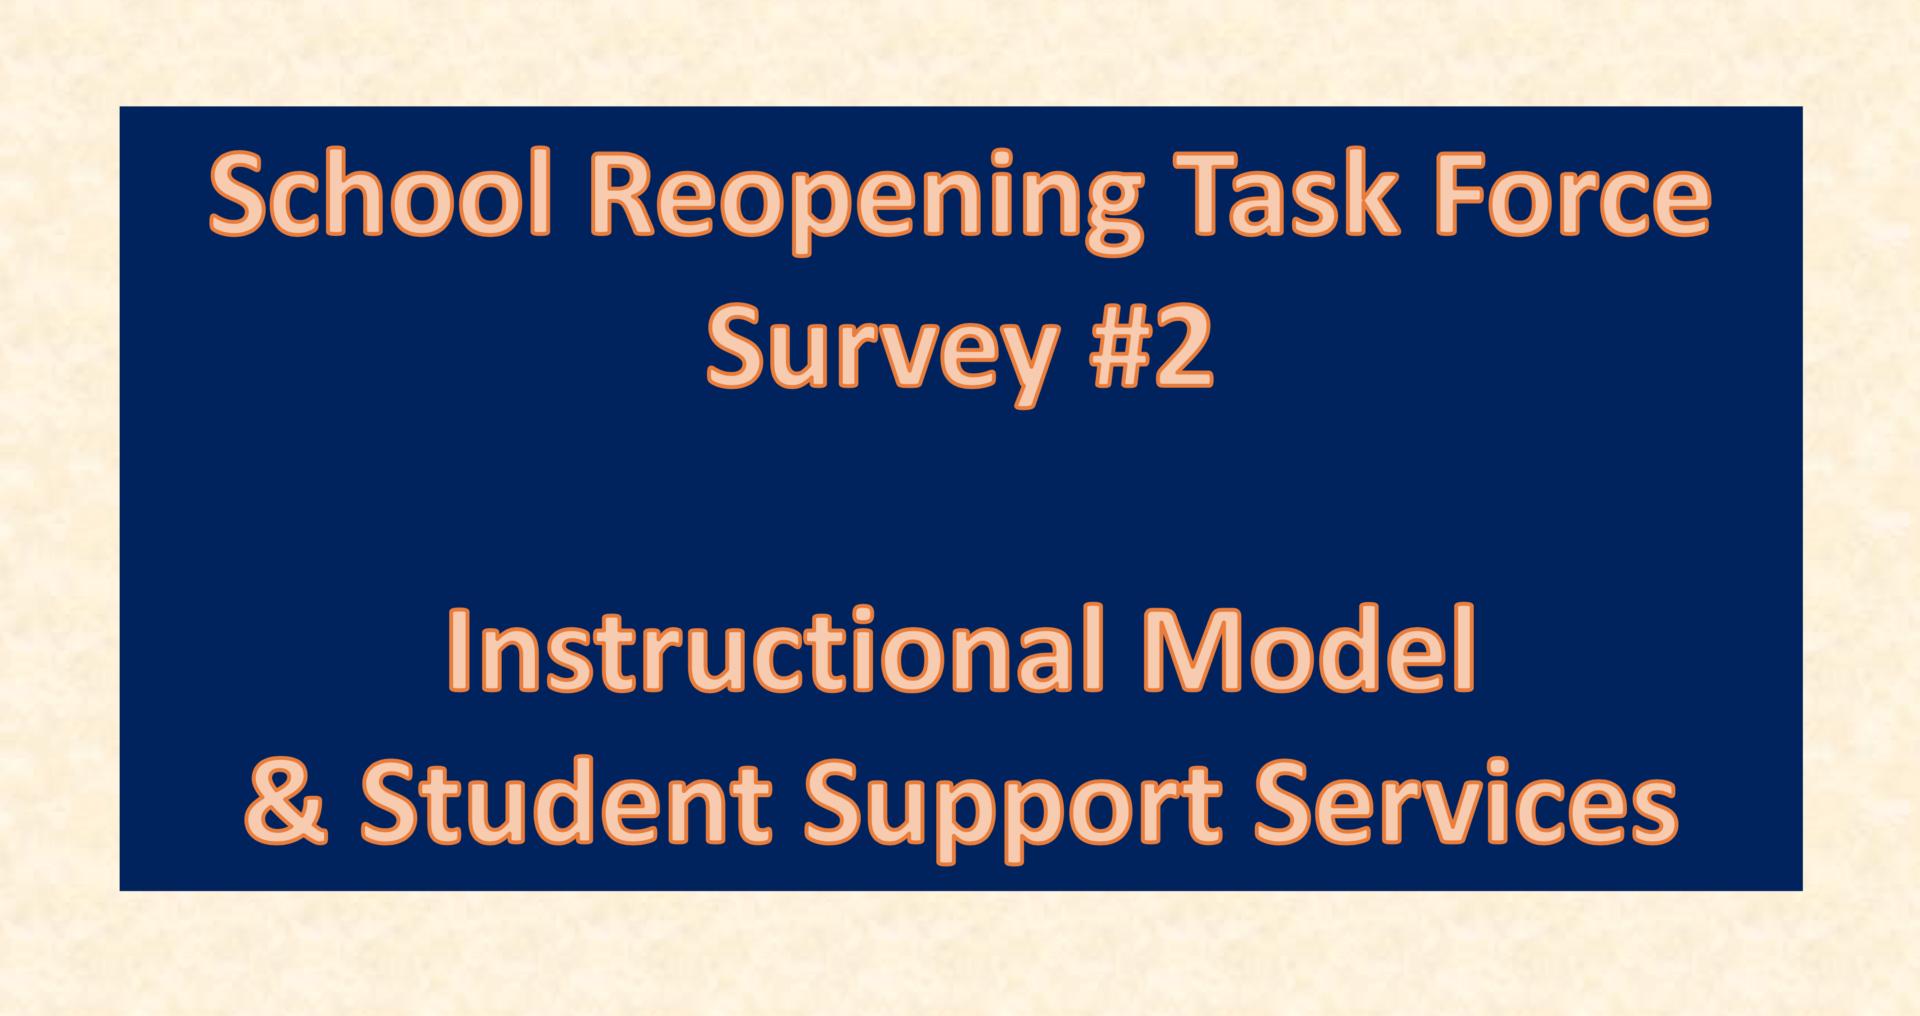 SRTF Survey 2 Results